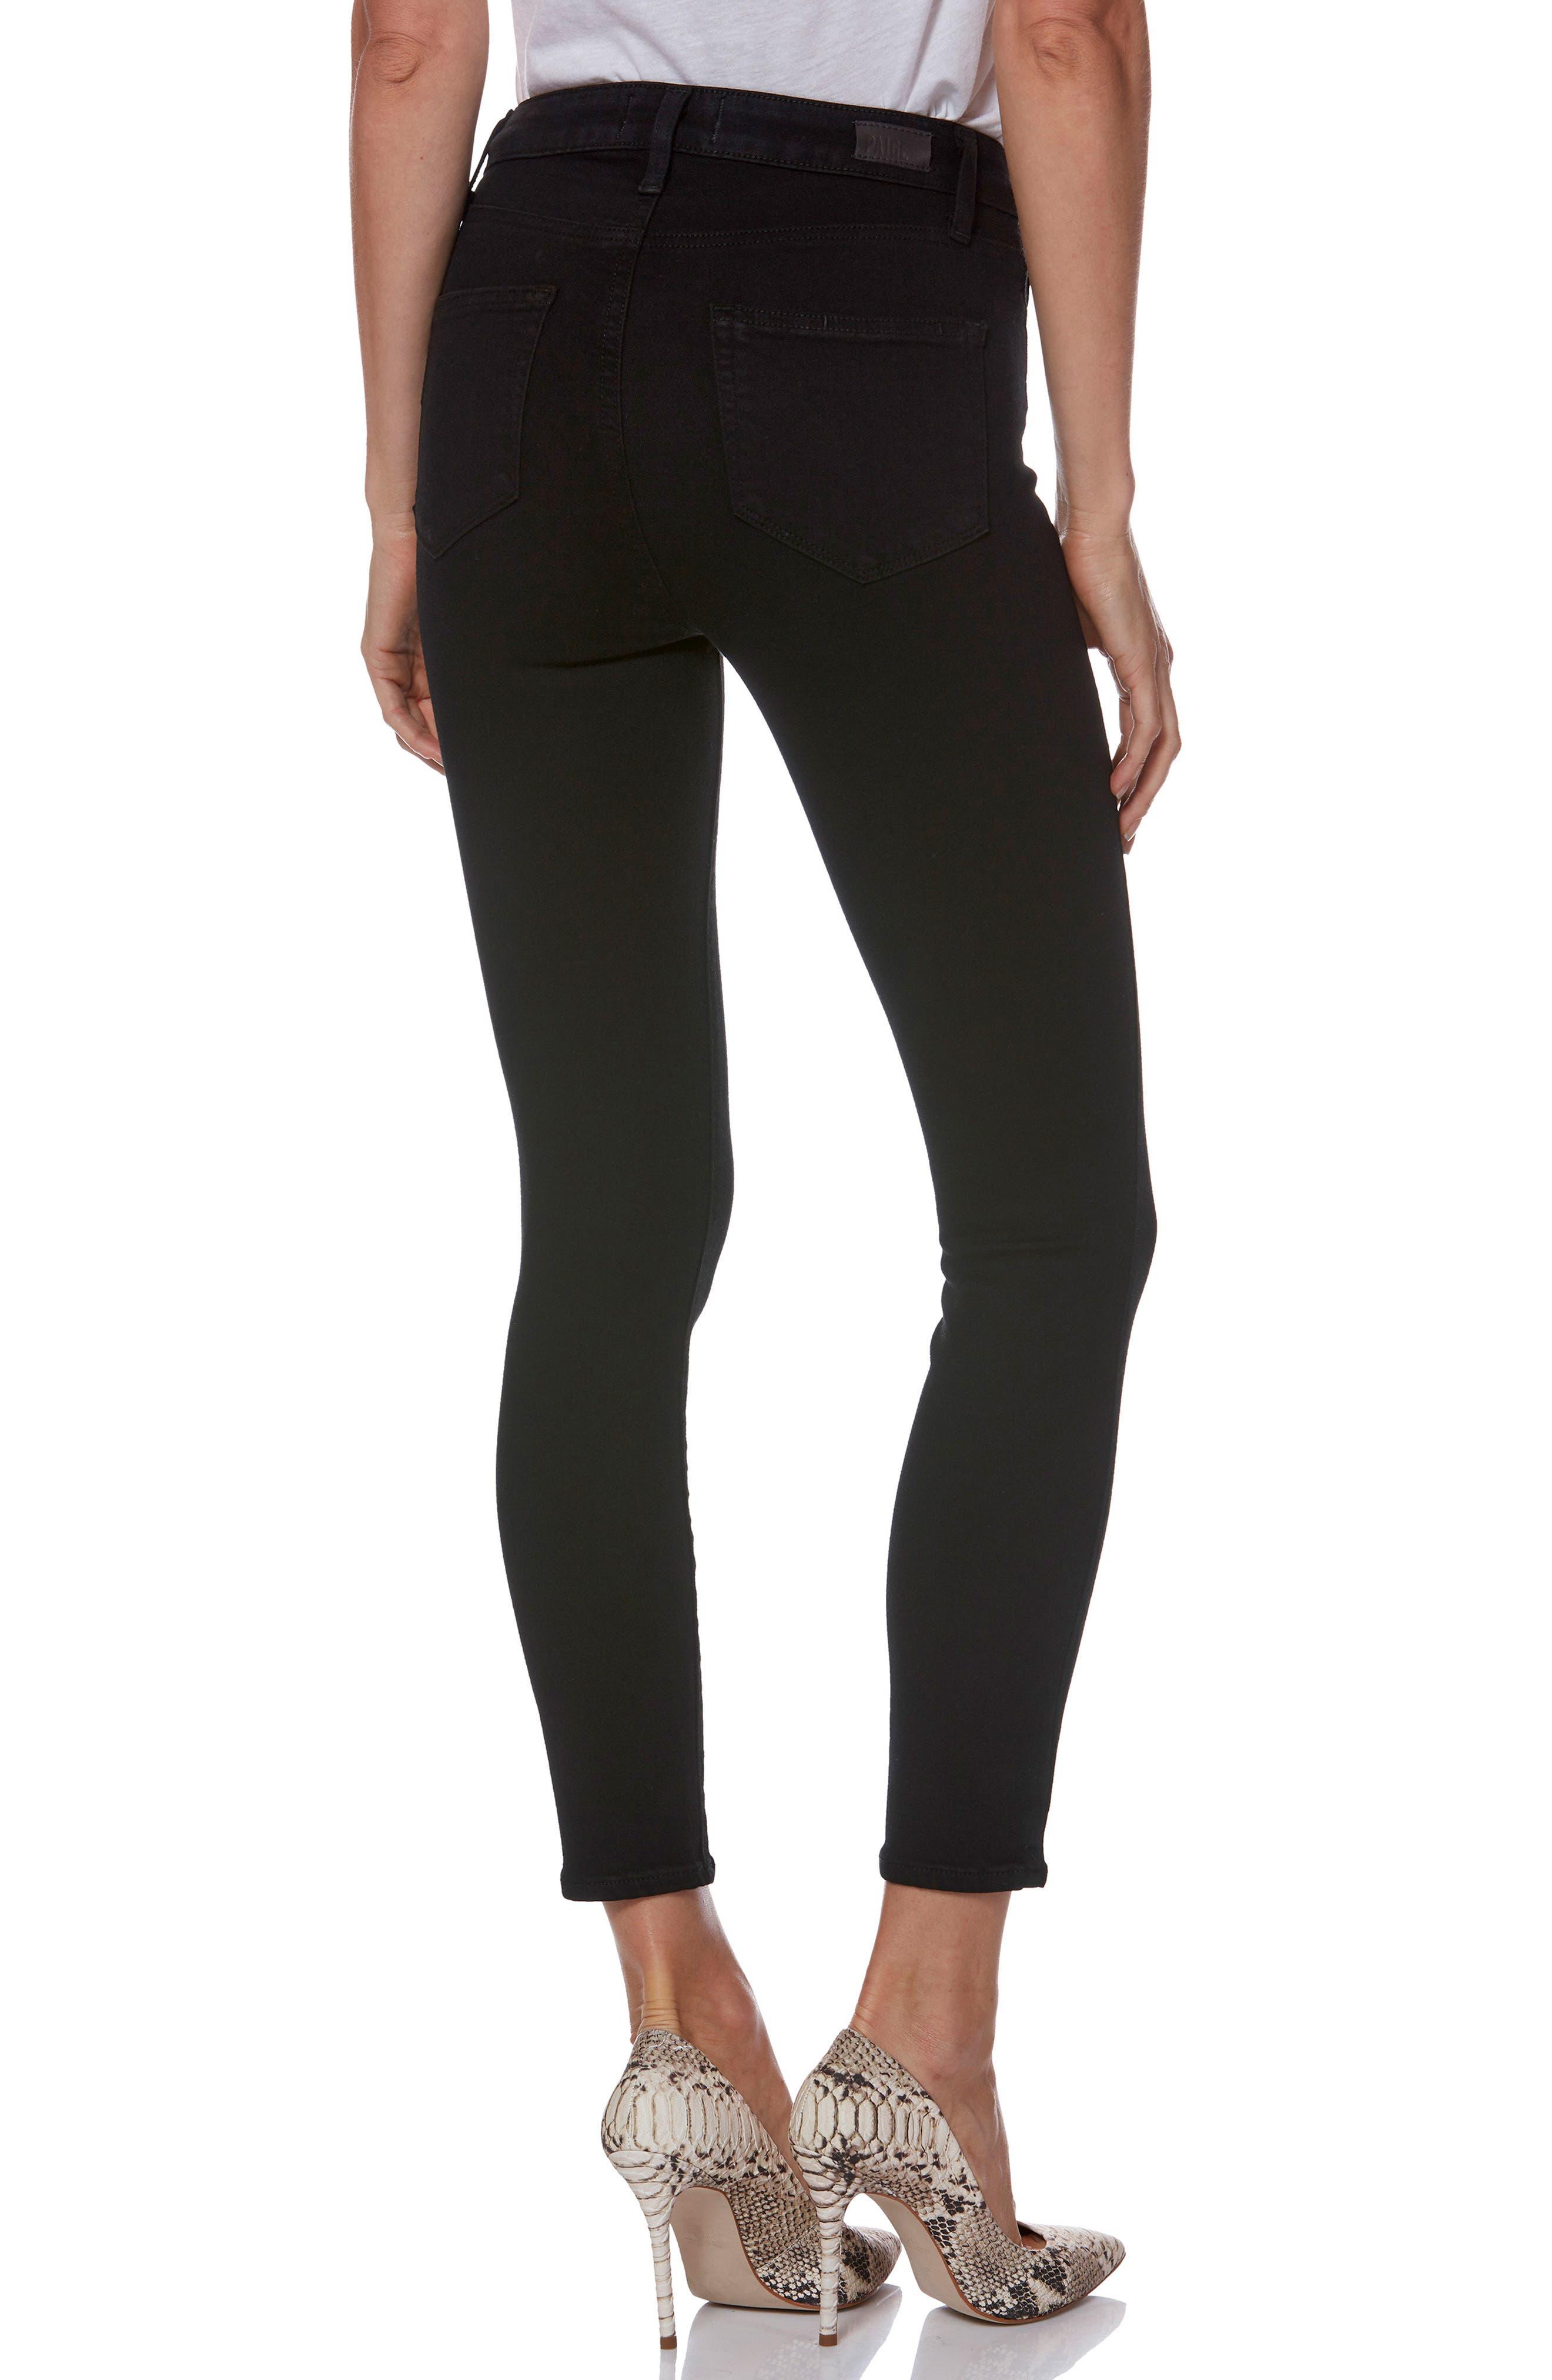 Transcend - Margot High Waist Crop Ultra Skinny Jeans,                             Alternate thumbnail 3, color,                             001